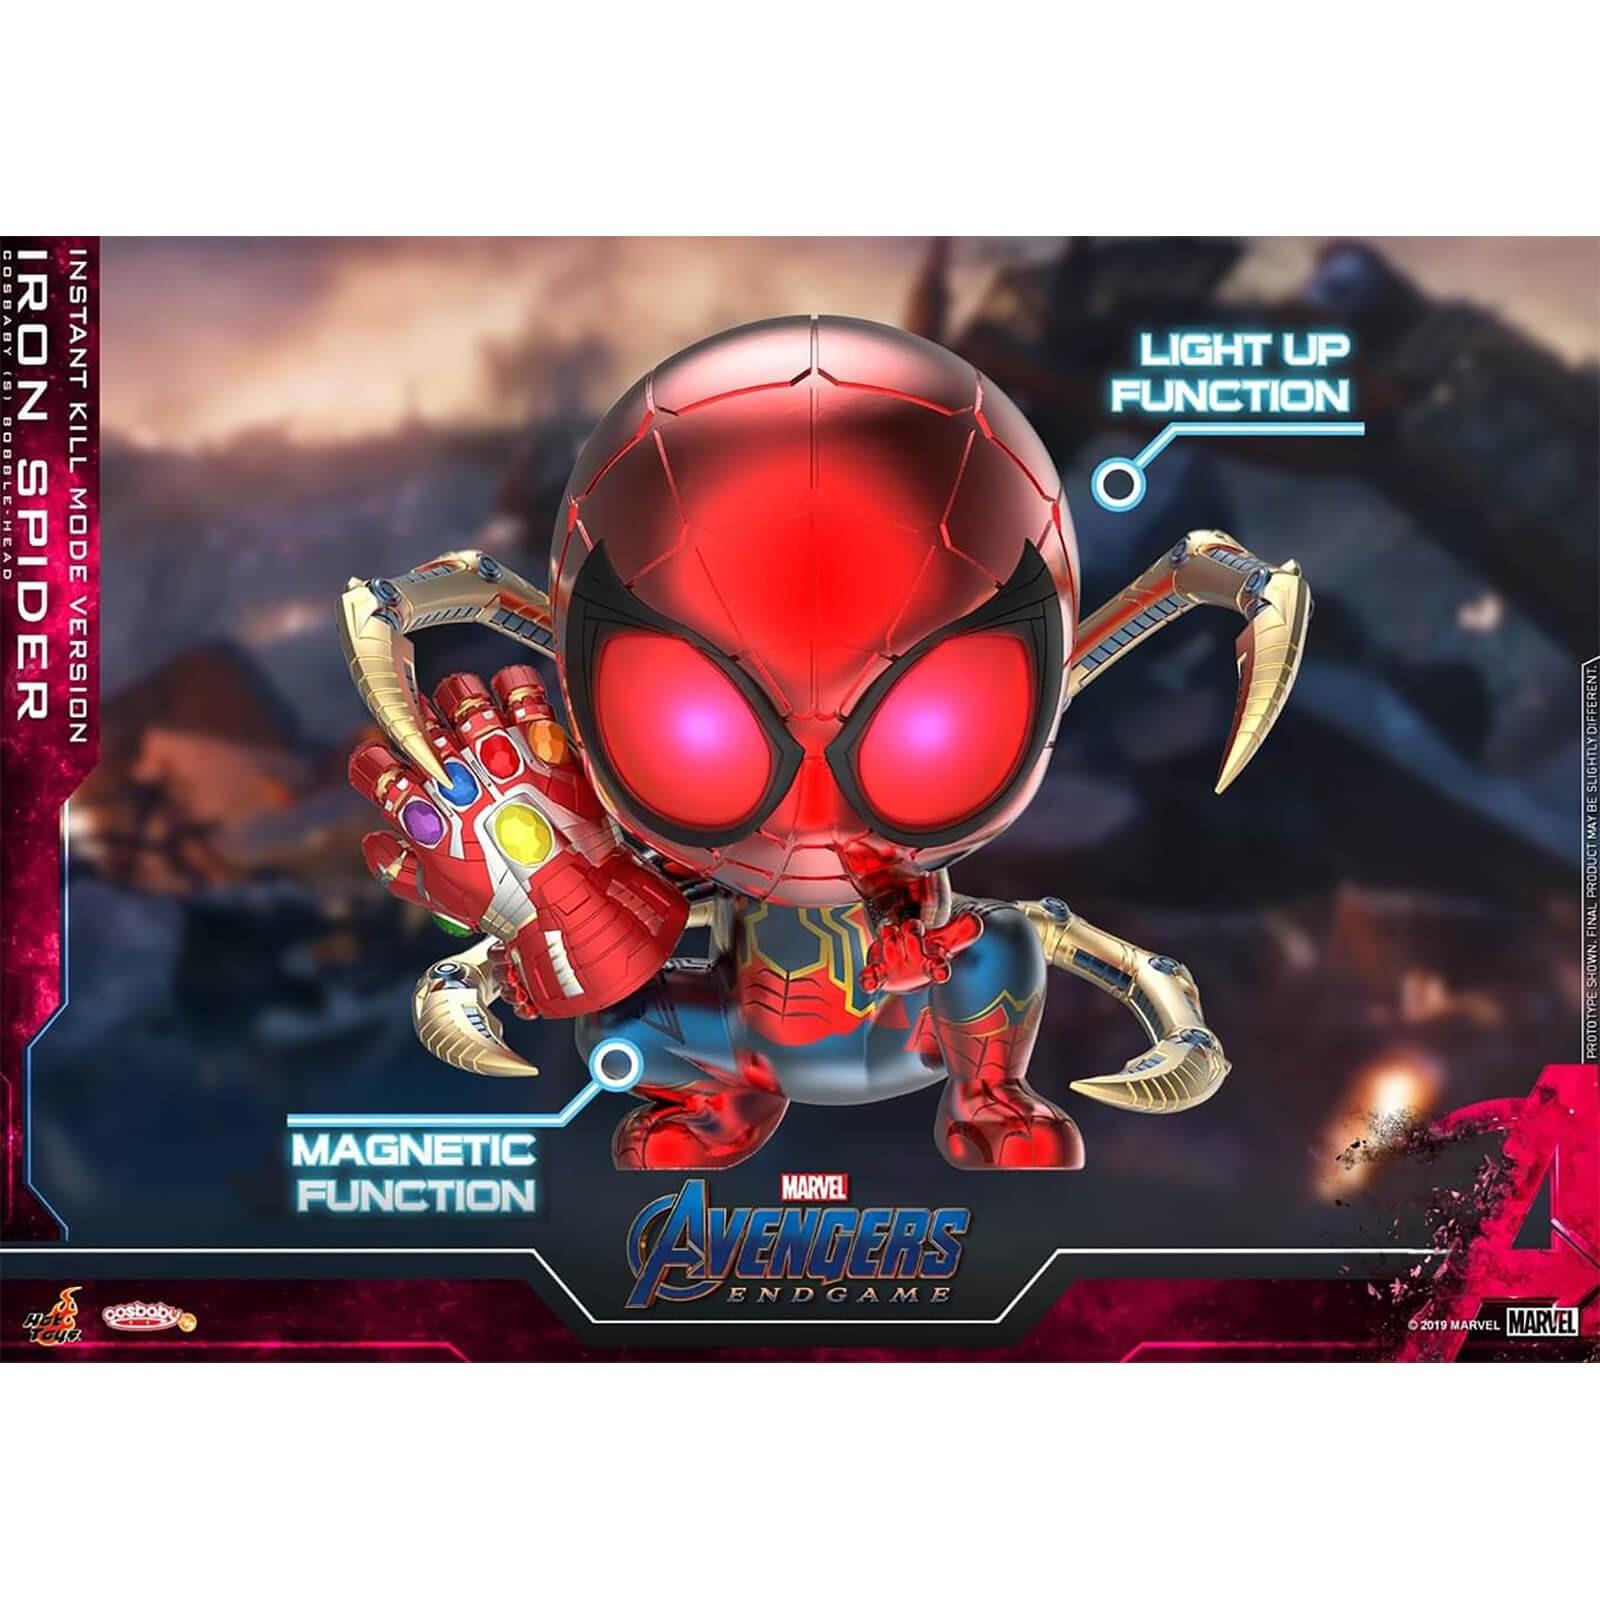 Marvel 漫威 复仇者联盟 iron spider Cosbaby玩具模型